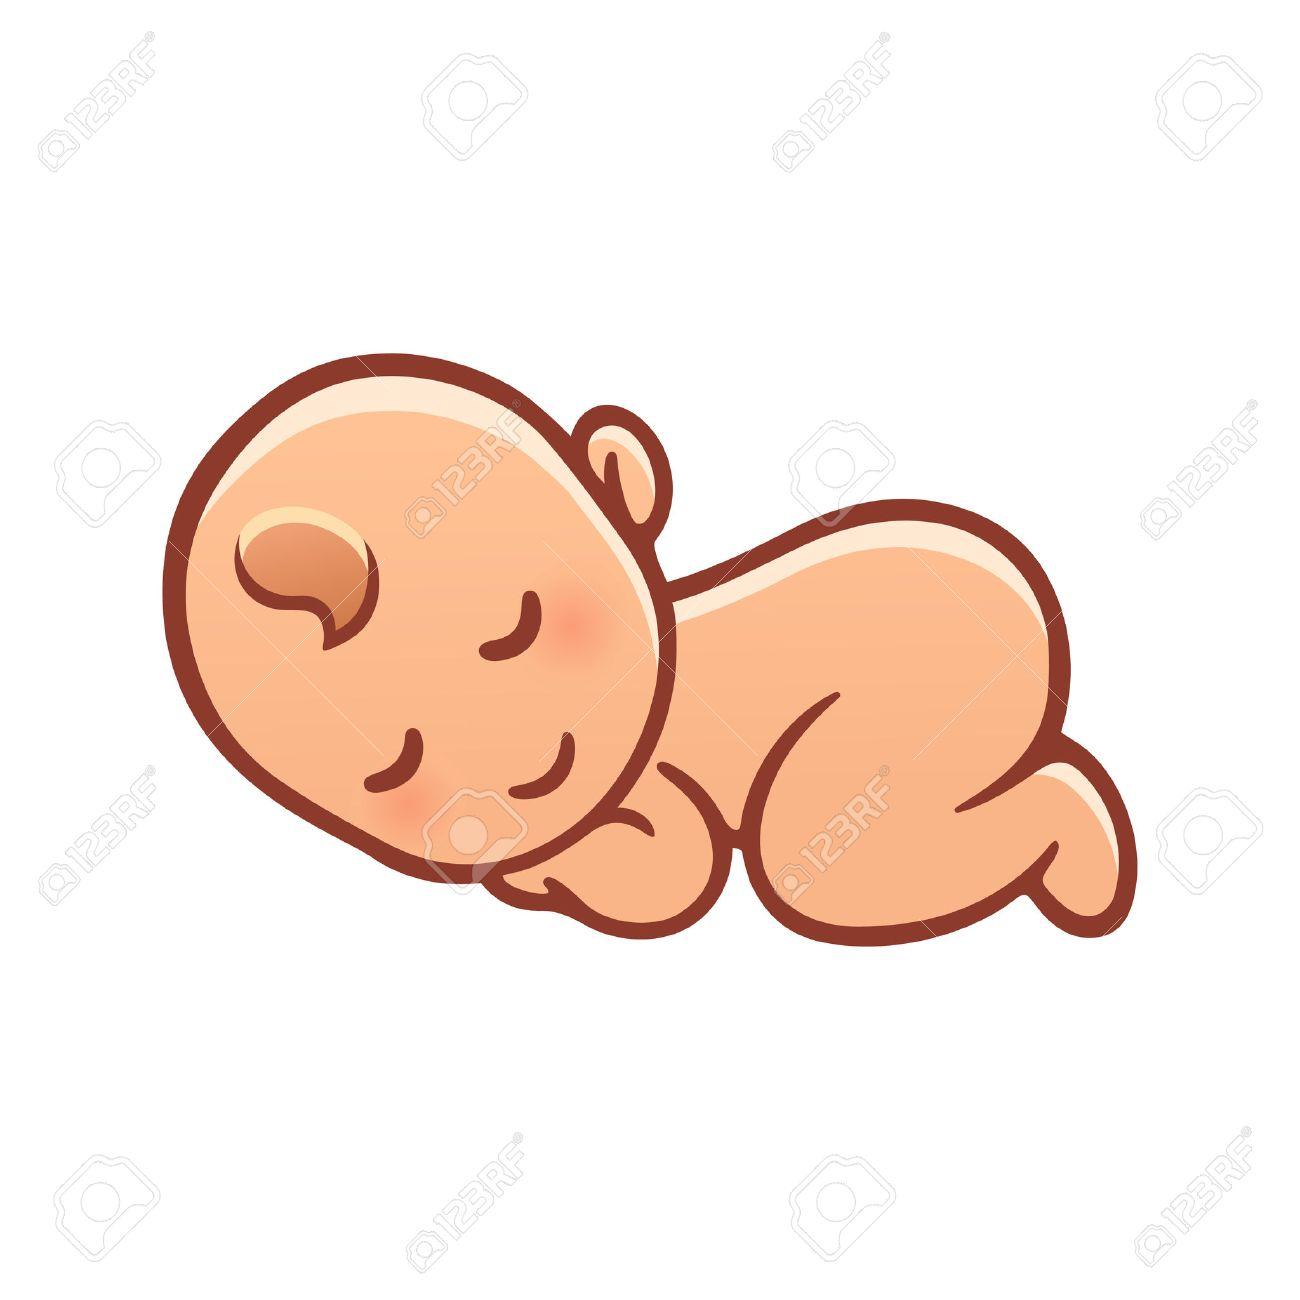 Sleeping Baby Drawing at GetDrawings | Free download